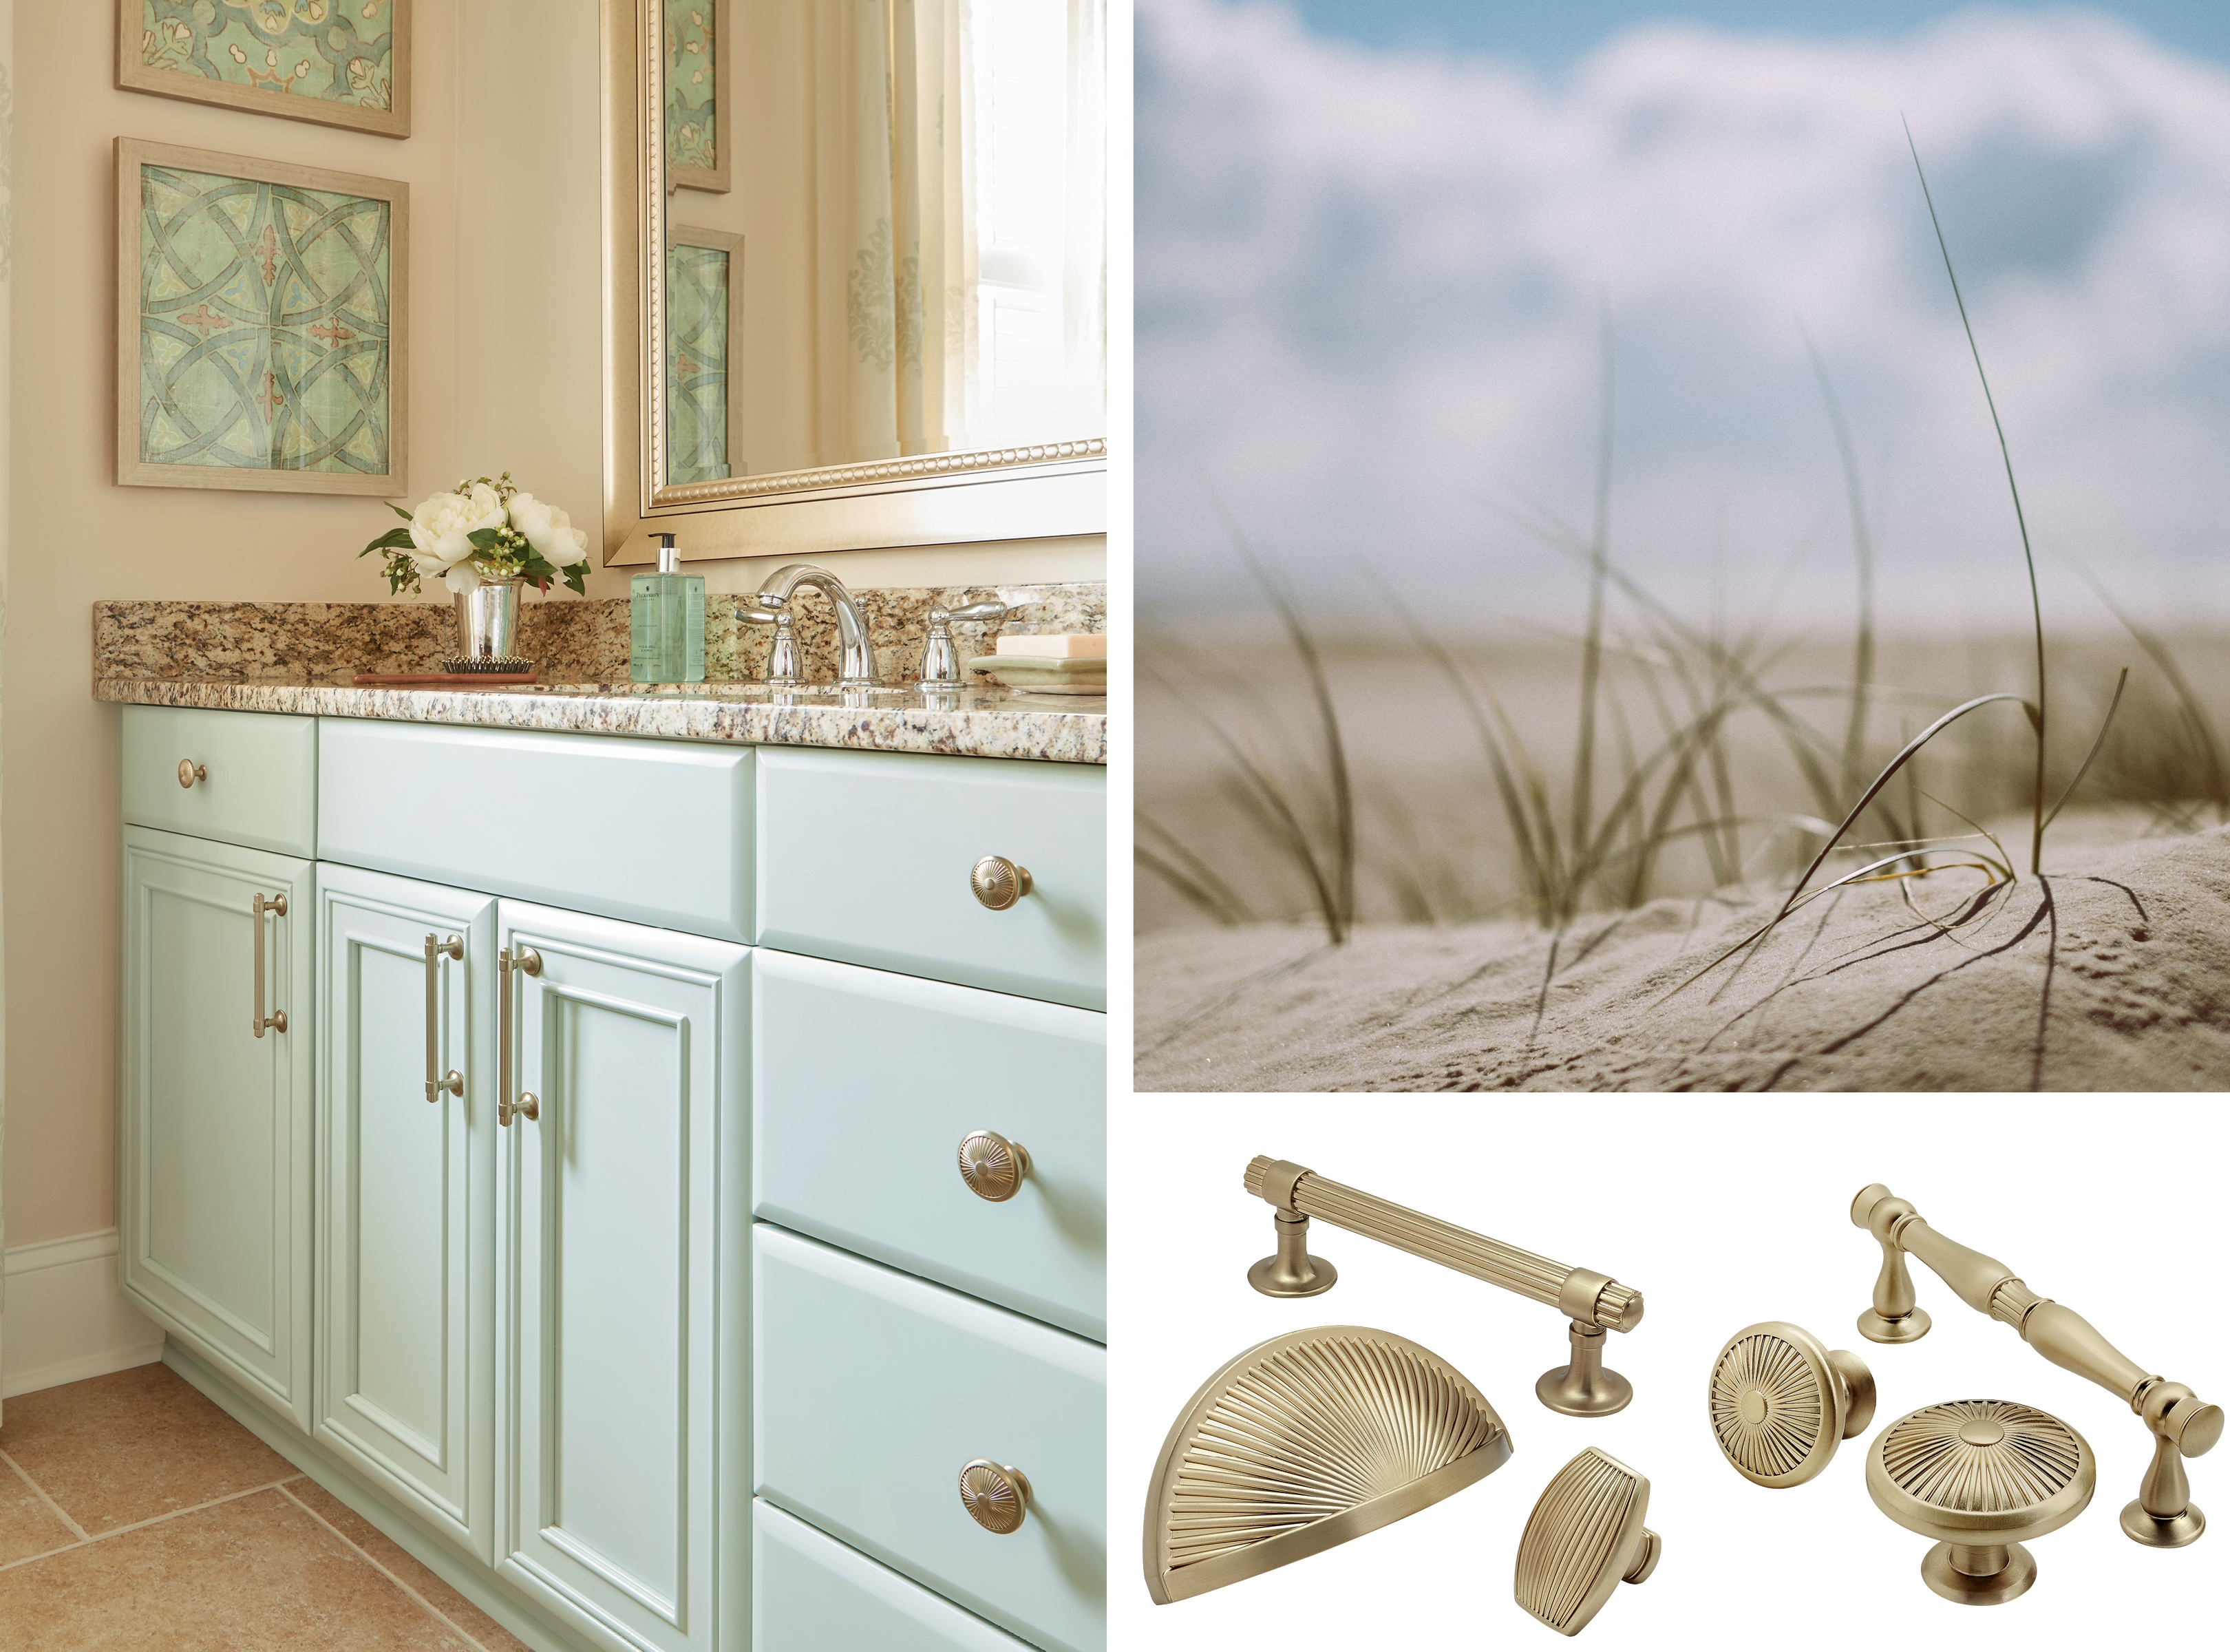 Golden-Champagne_Knobs-Pulls_Amerock_Cabinet-Hardware_Sea-Grass_Bath_2016.jpg?t=1525920547282